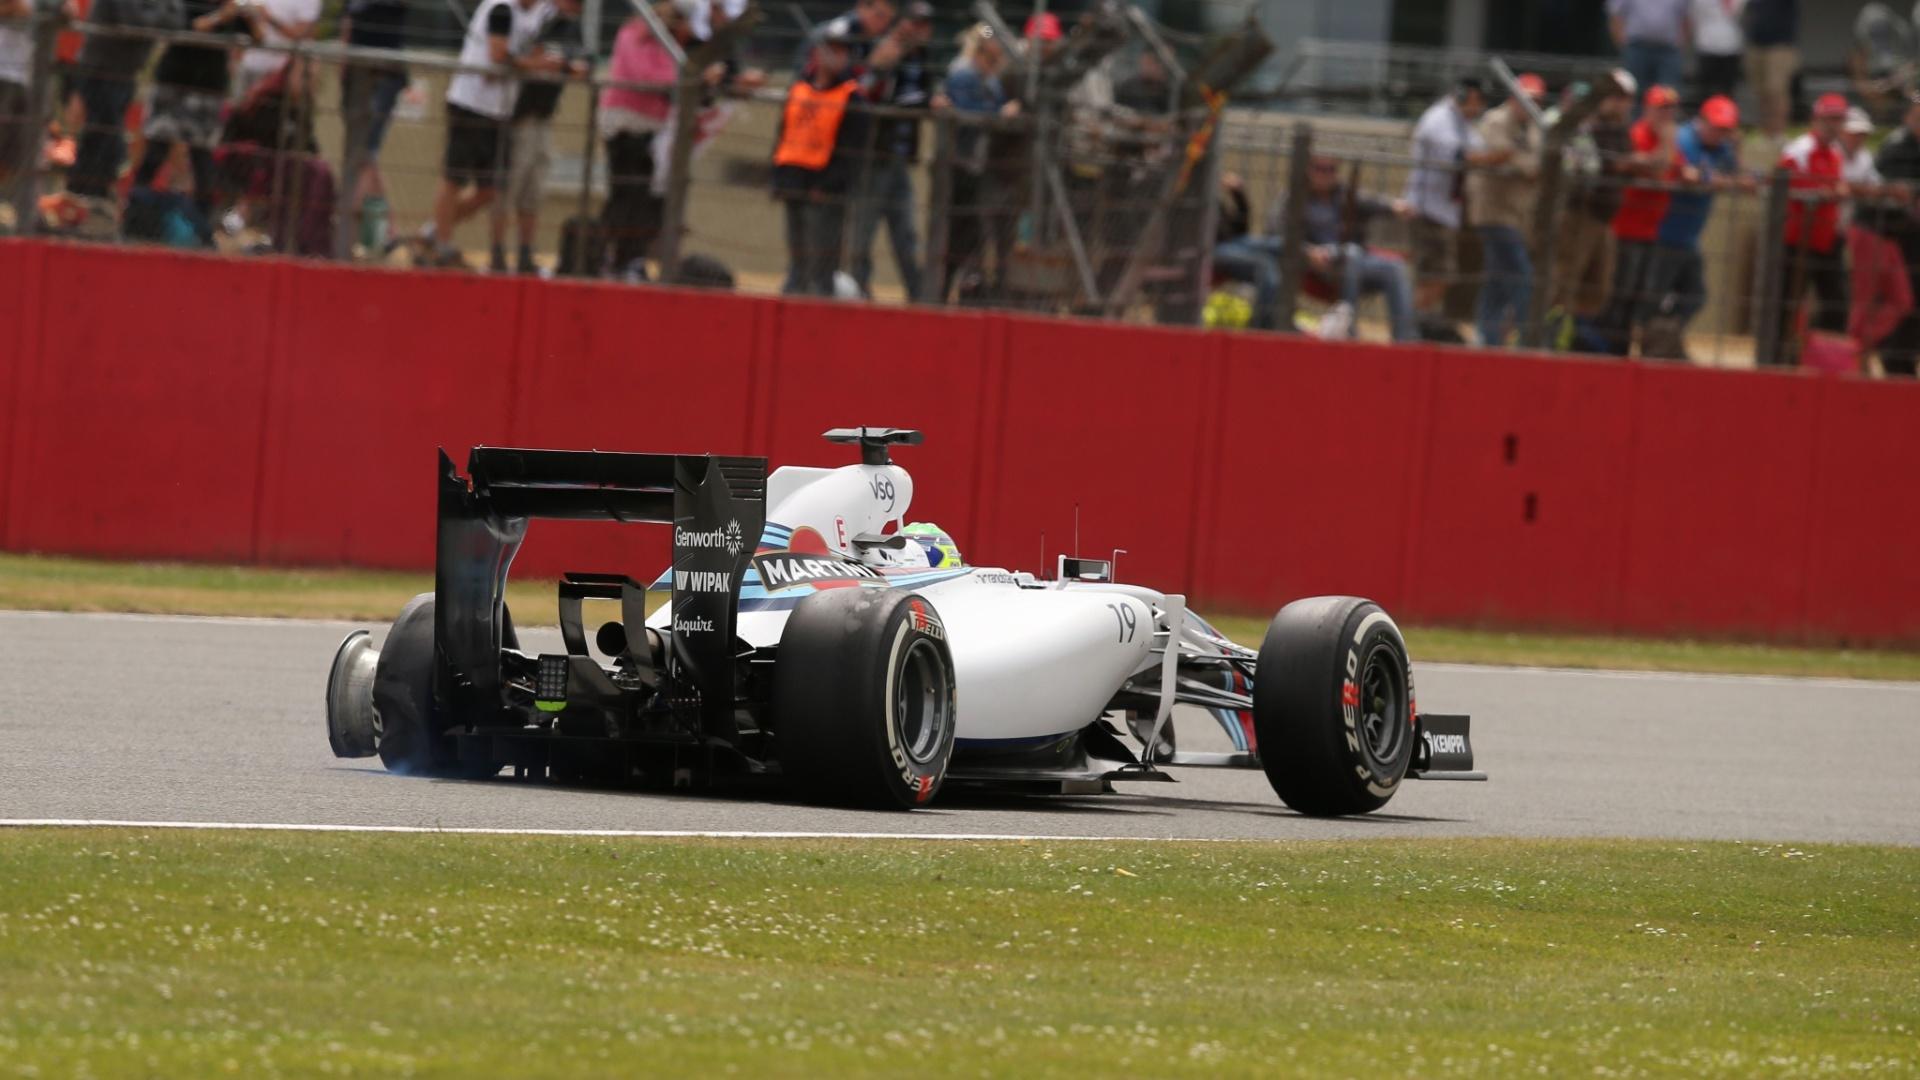 06.jul.2014 - Massa sofreu batida de Räikkönen e abandonou GP da Inglaterra na 1ª volta